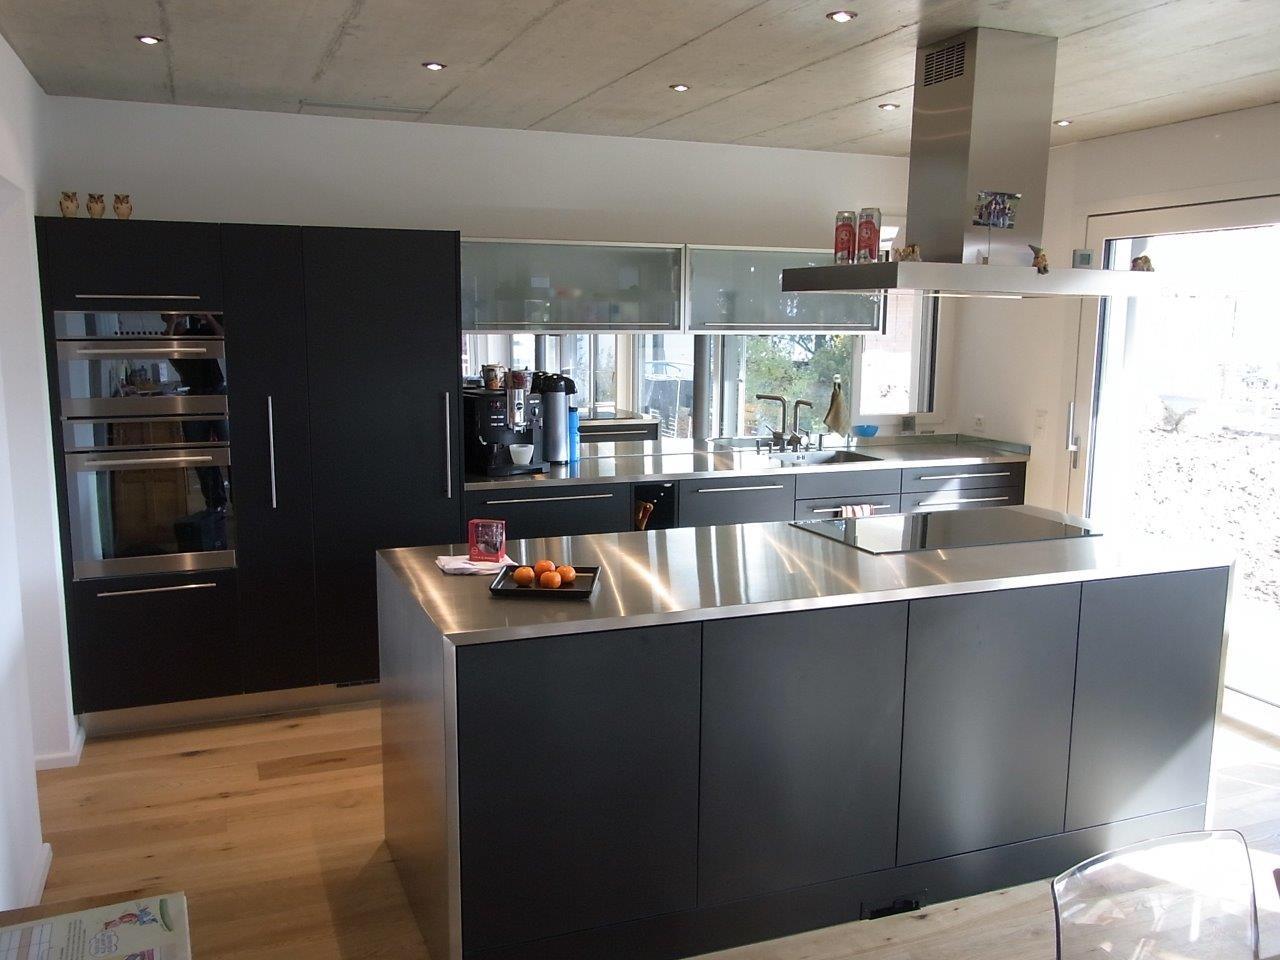 gute kuche bar los arcos wahnsinns gute kche sehr nette bedienung und spontan fr entzckend fr. Black Bedroom Furniture Sets. Home Design Ideas